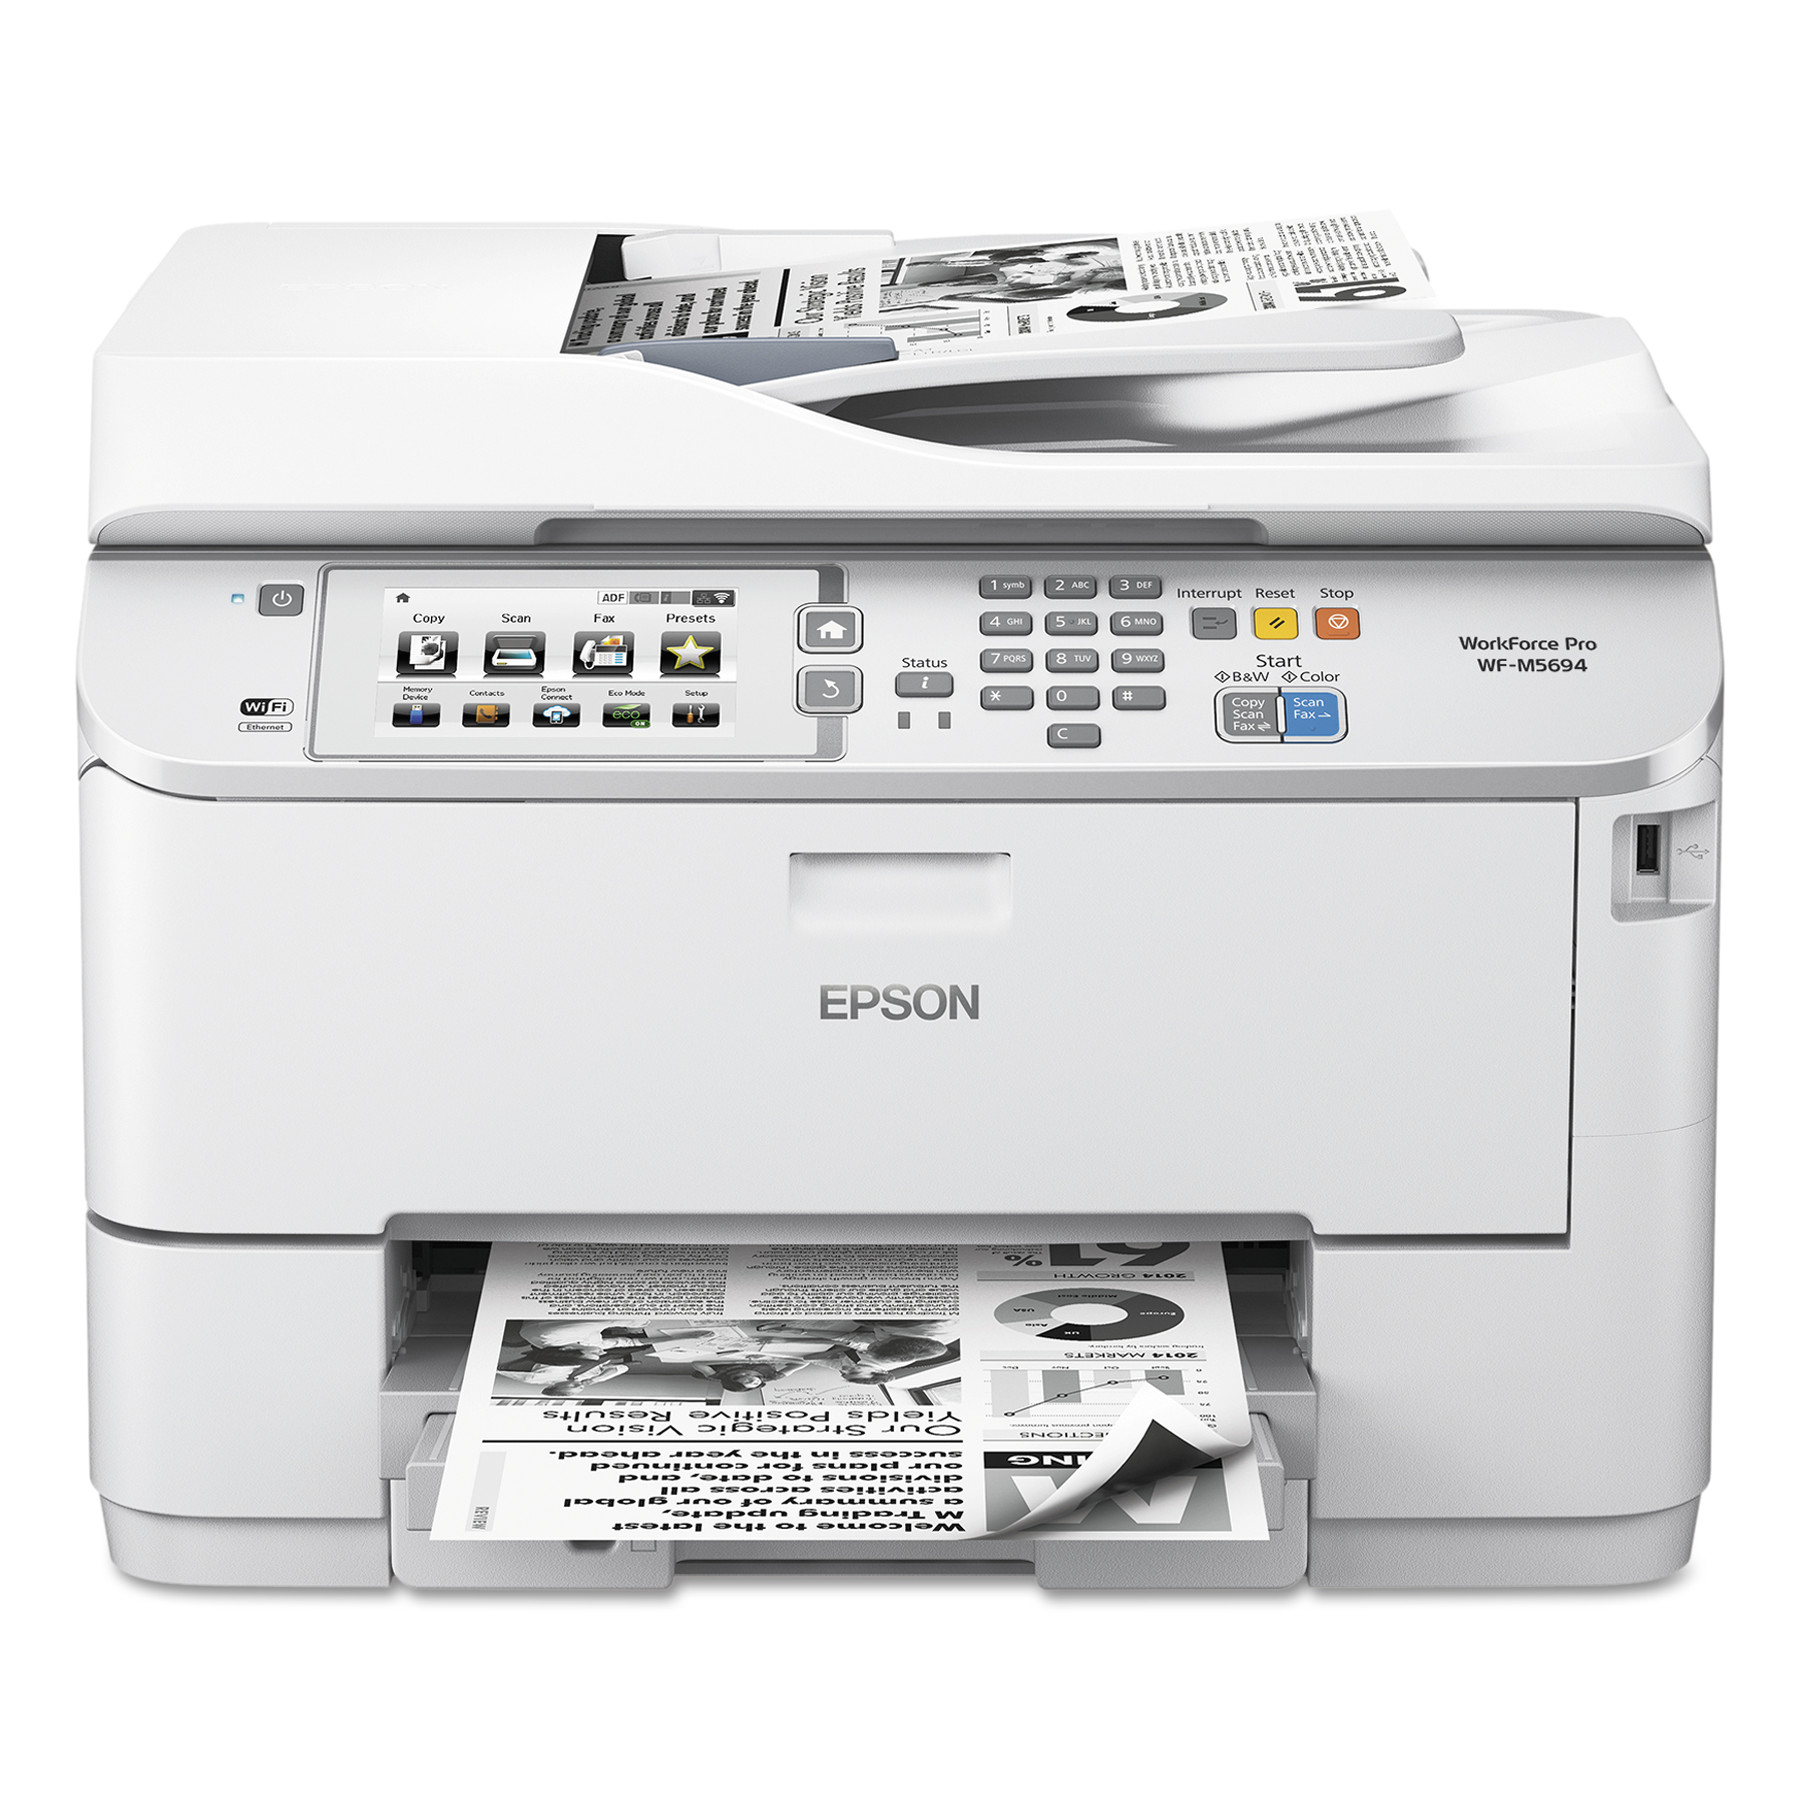 Epson WorkForce Pro M5694 Printer